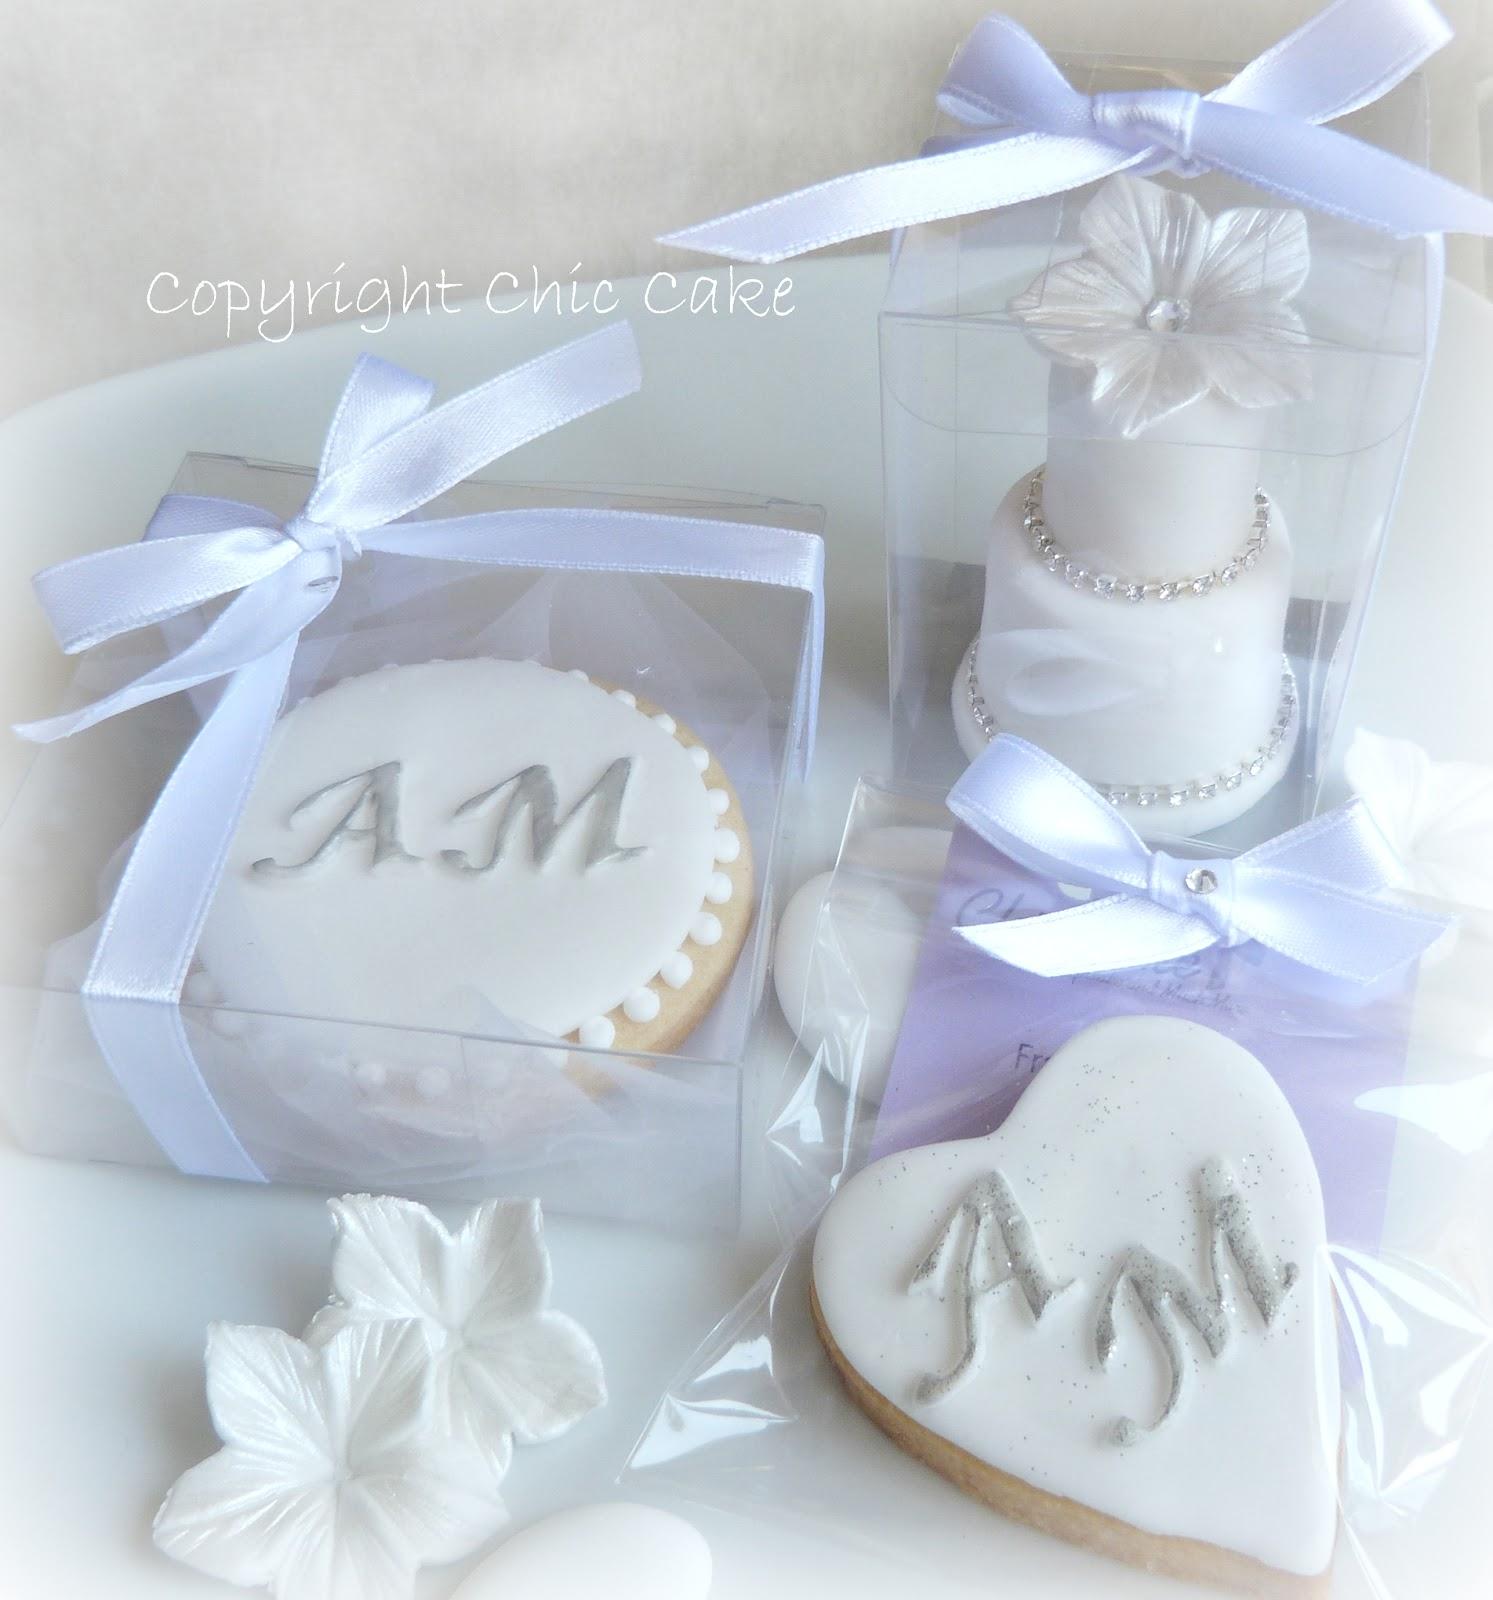 Segnaposto Matrimonio Biscotti.Chic Cake Biscotti Matrimonio Wedding Cookie